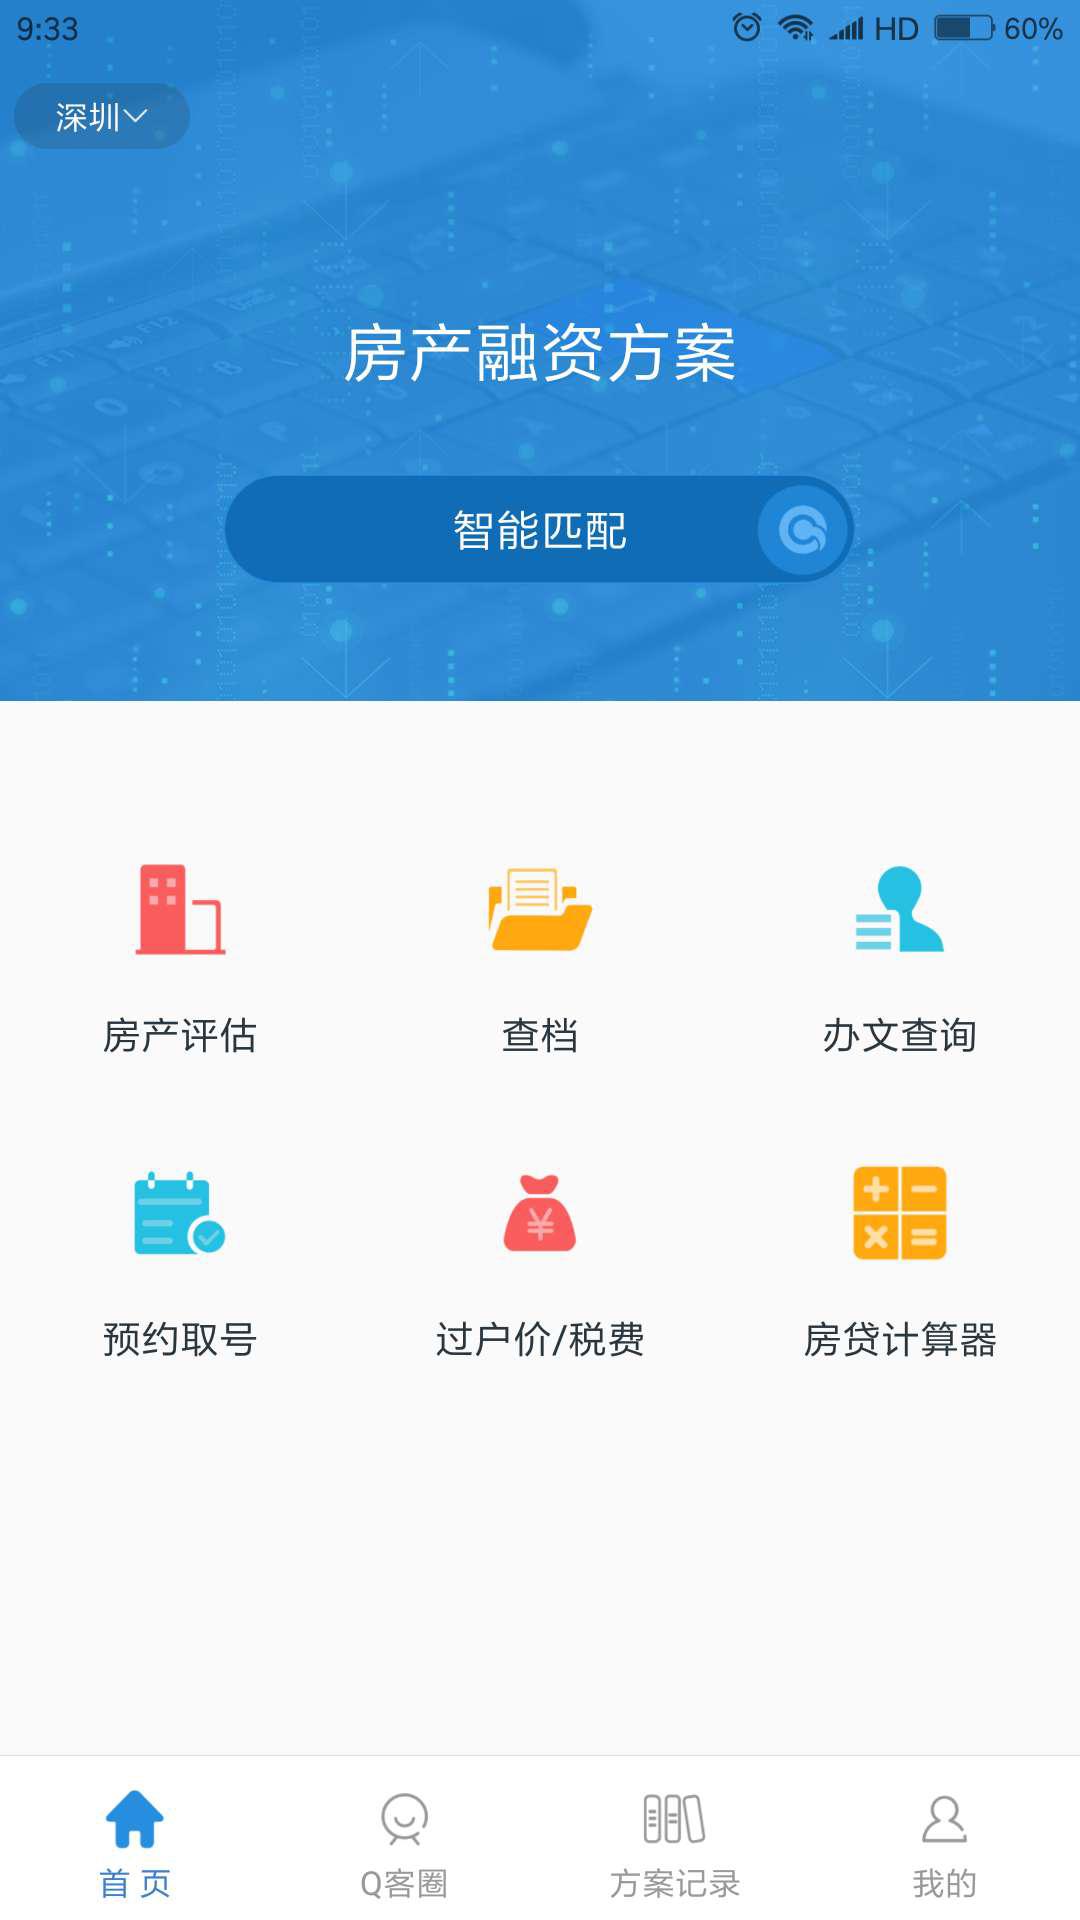 Q客按揭app官方手机版图4: